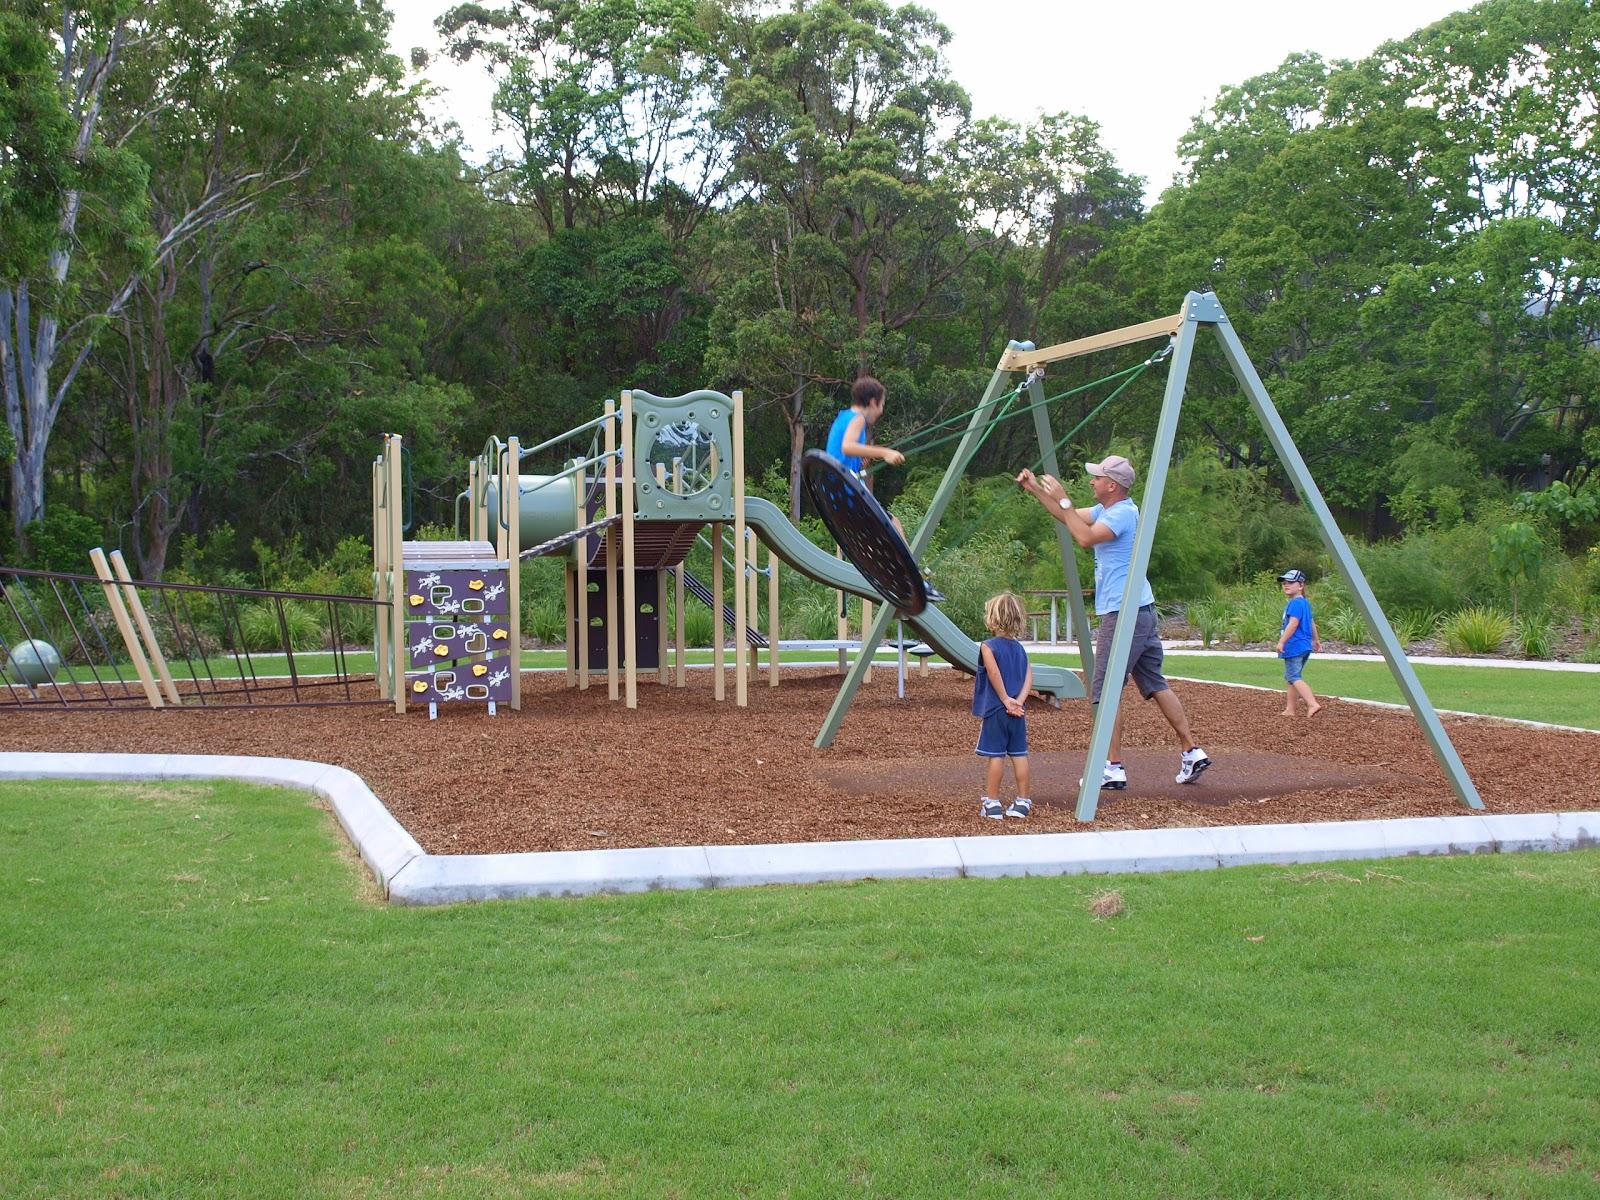 Backyard Playground Ideas :  unarixcominstallationBackuplanguagesmallbackyardplaygroundideas